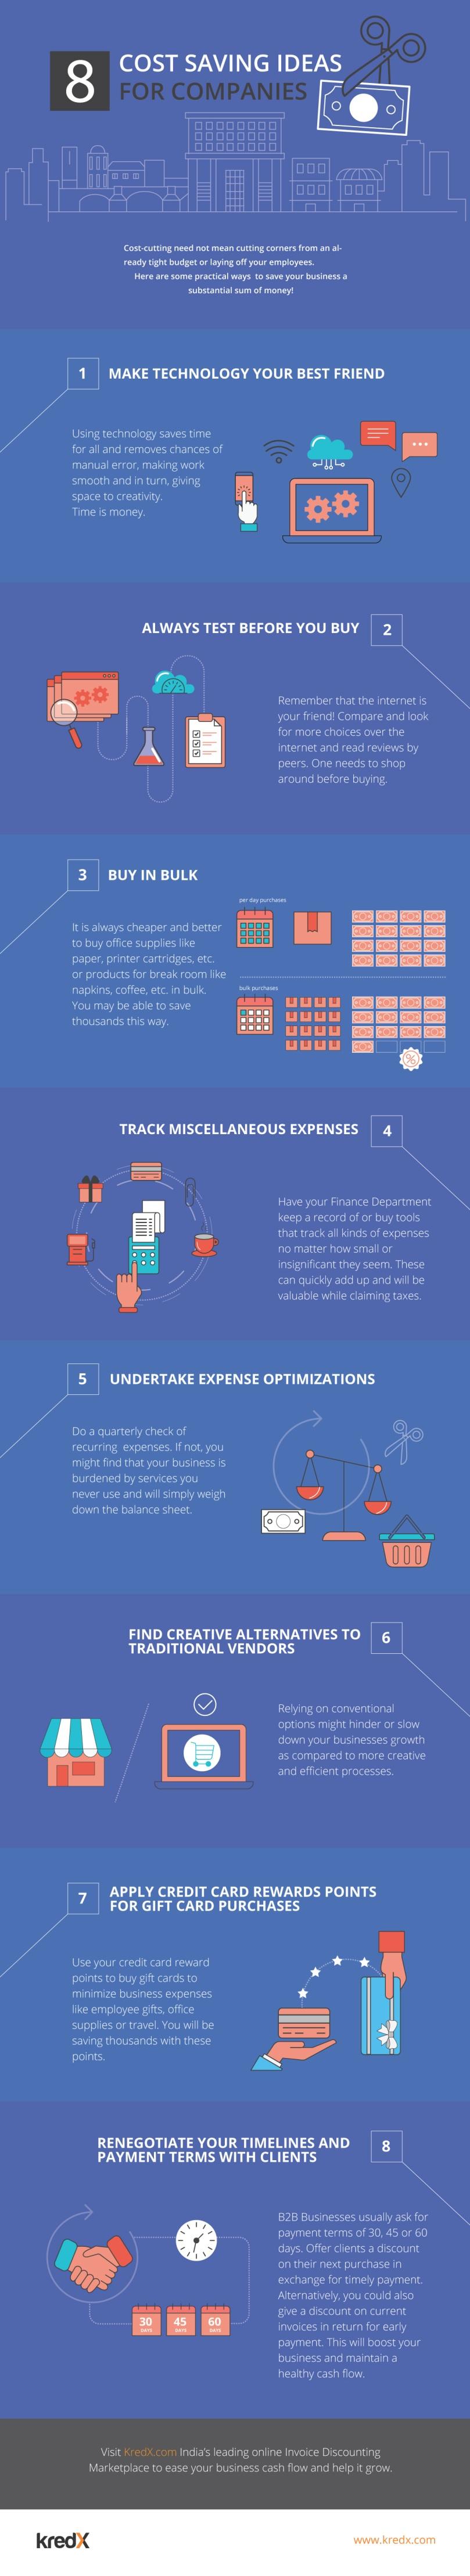 KredX- 8 Cost Saving Ideas for Business